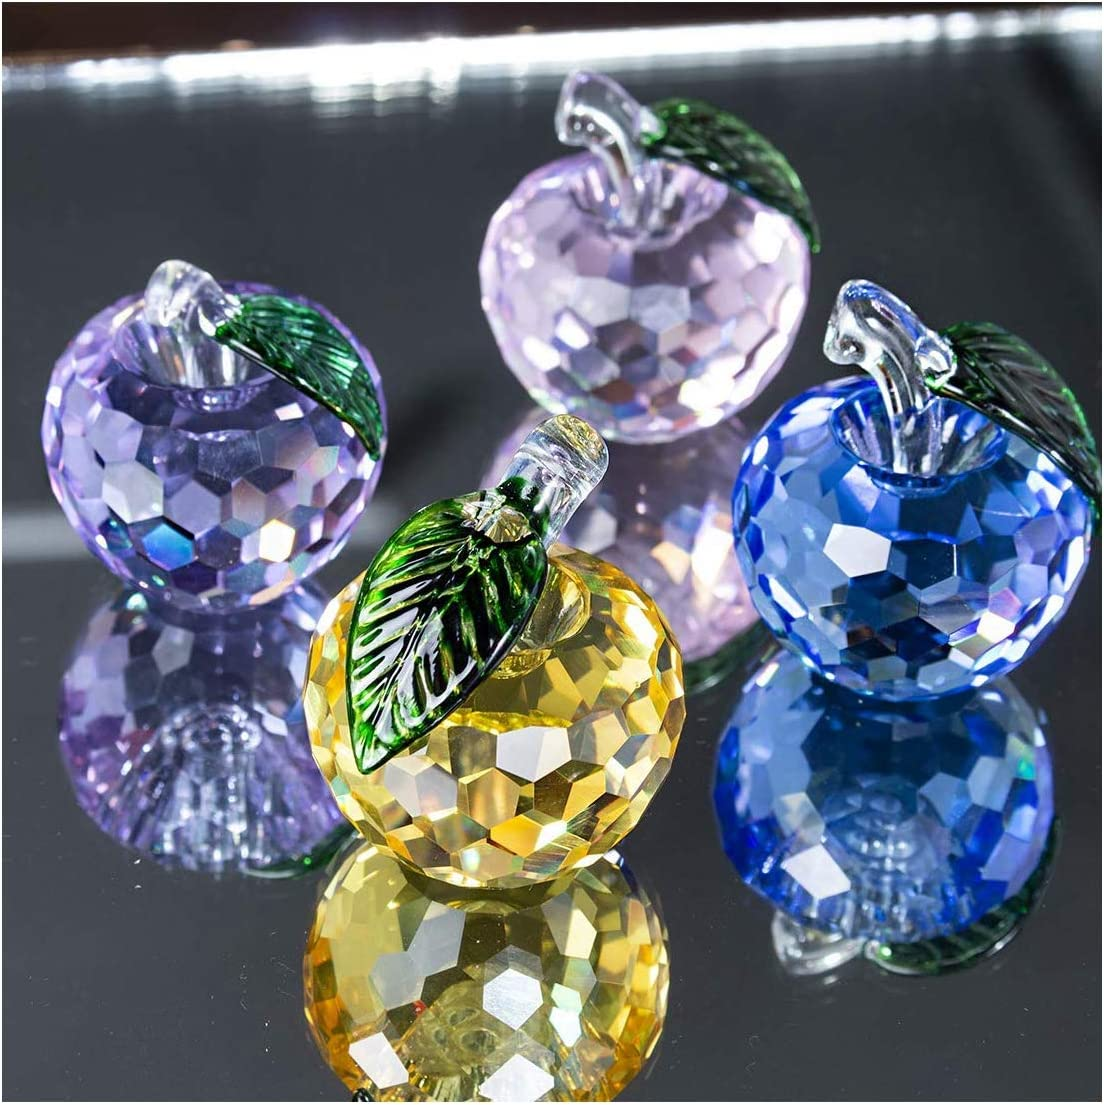 H&D HYALINE & DORA Crystal Apple Figurines Glass Apple Paperweight Home Desktop Ornament (Apple-Set of 4)